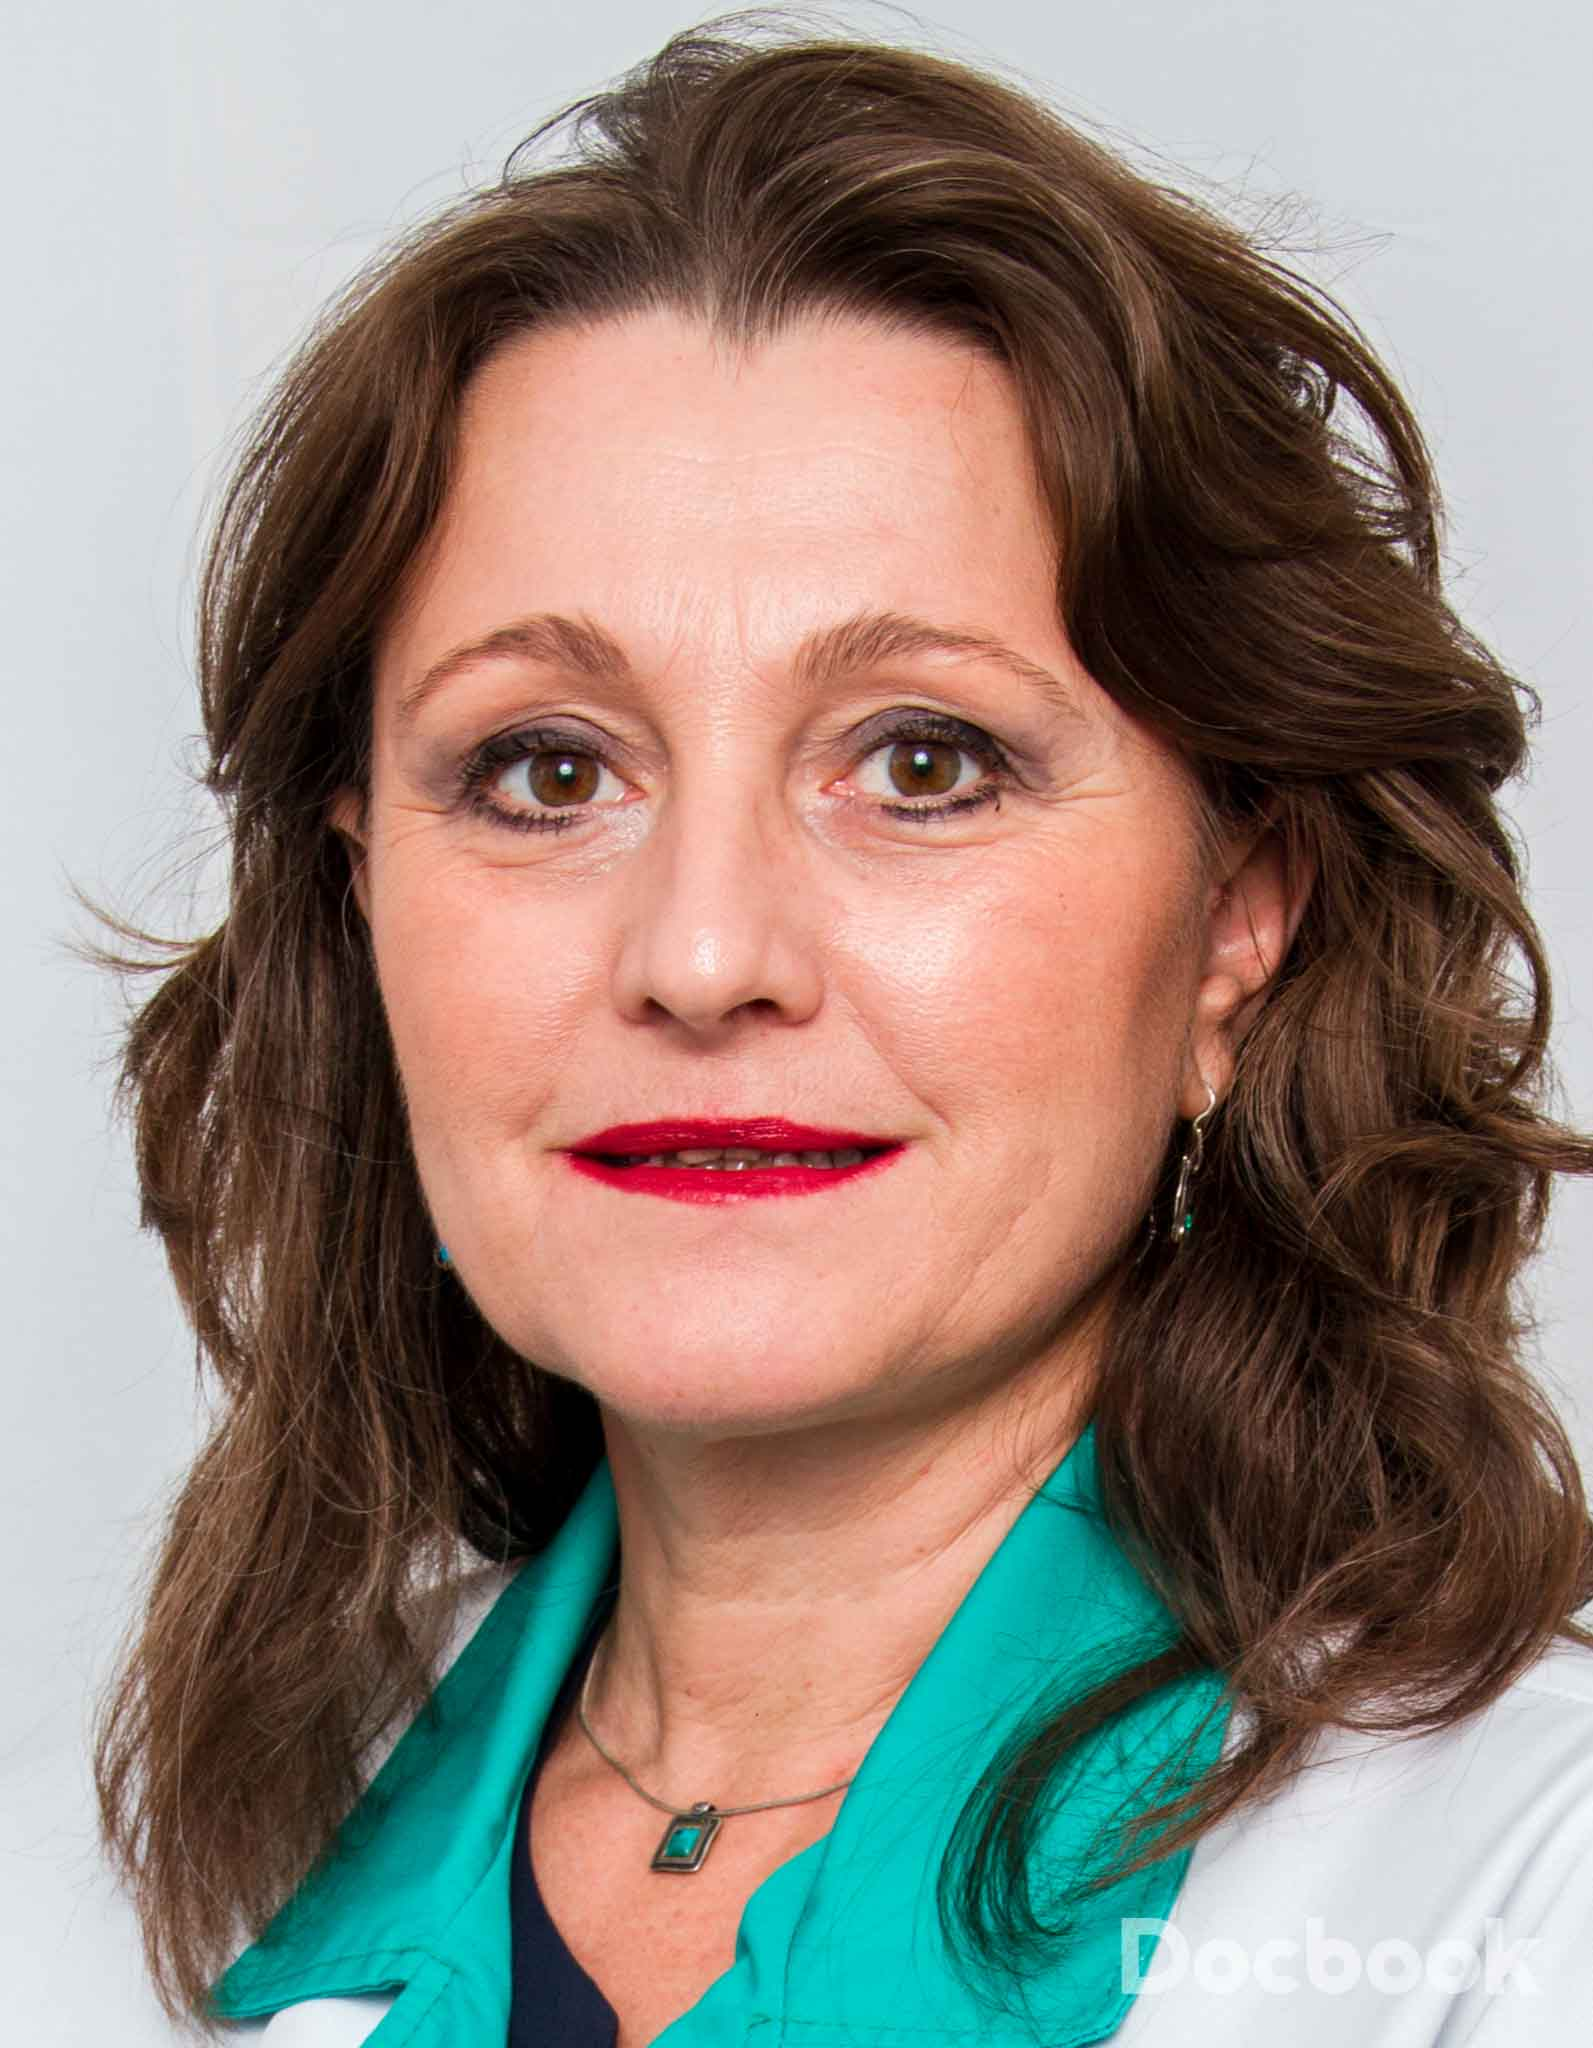 Dr. Irina-Cristina Manoliu